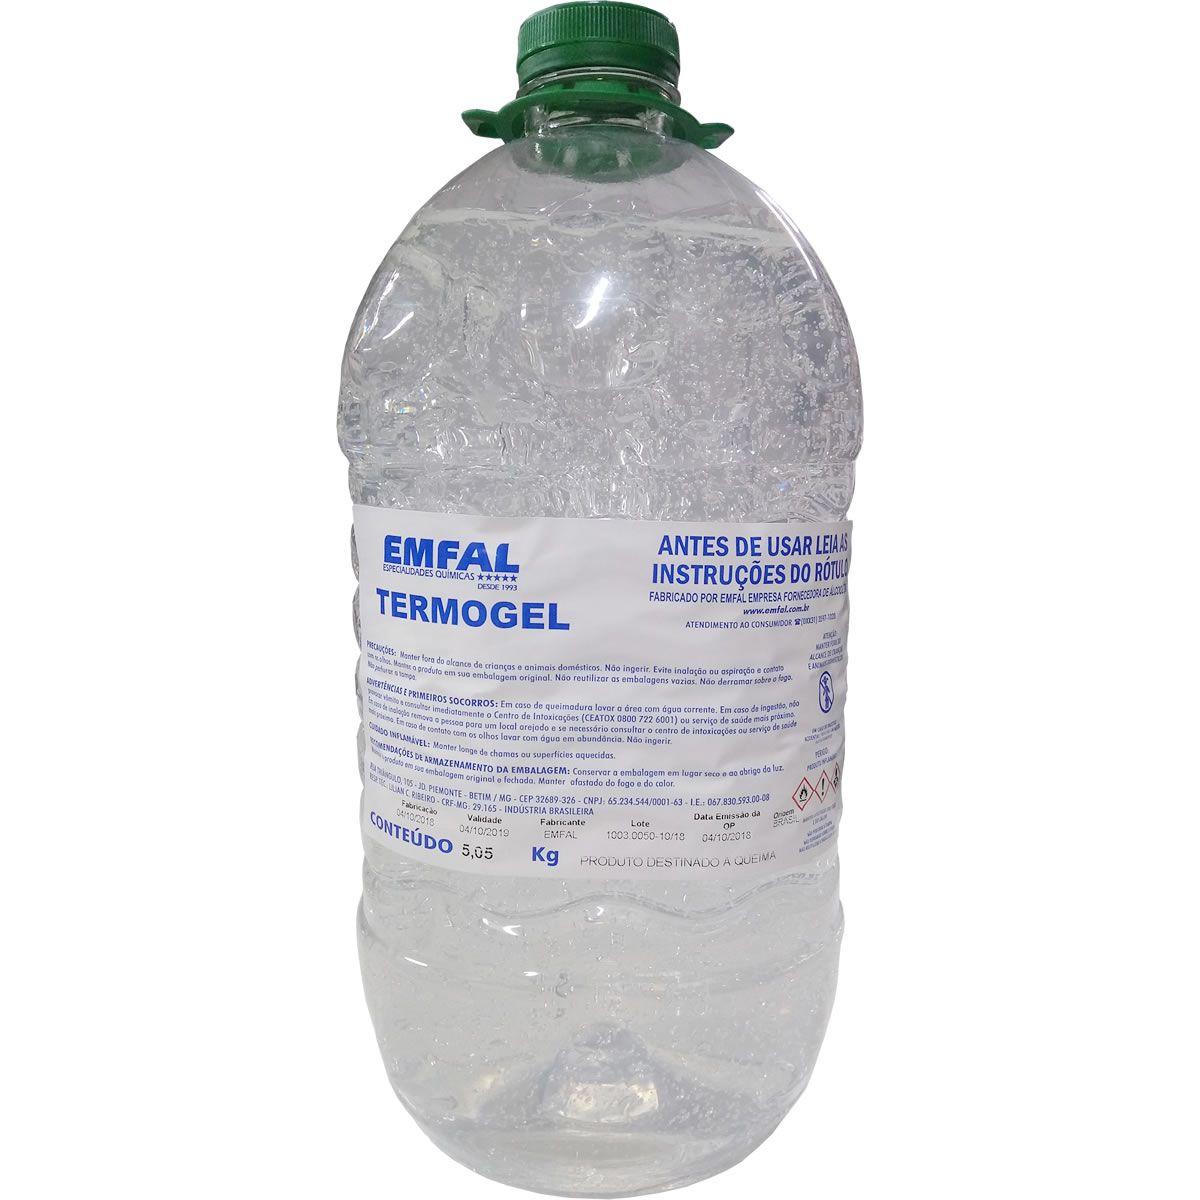 Termogel - Álcool em Gel 70% Pet 5,05 KG - Máximo 3 un por pedido